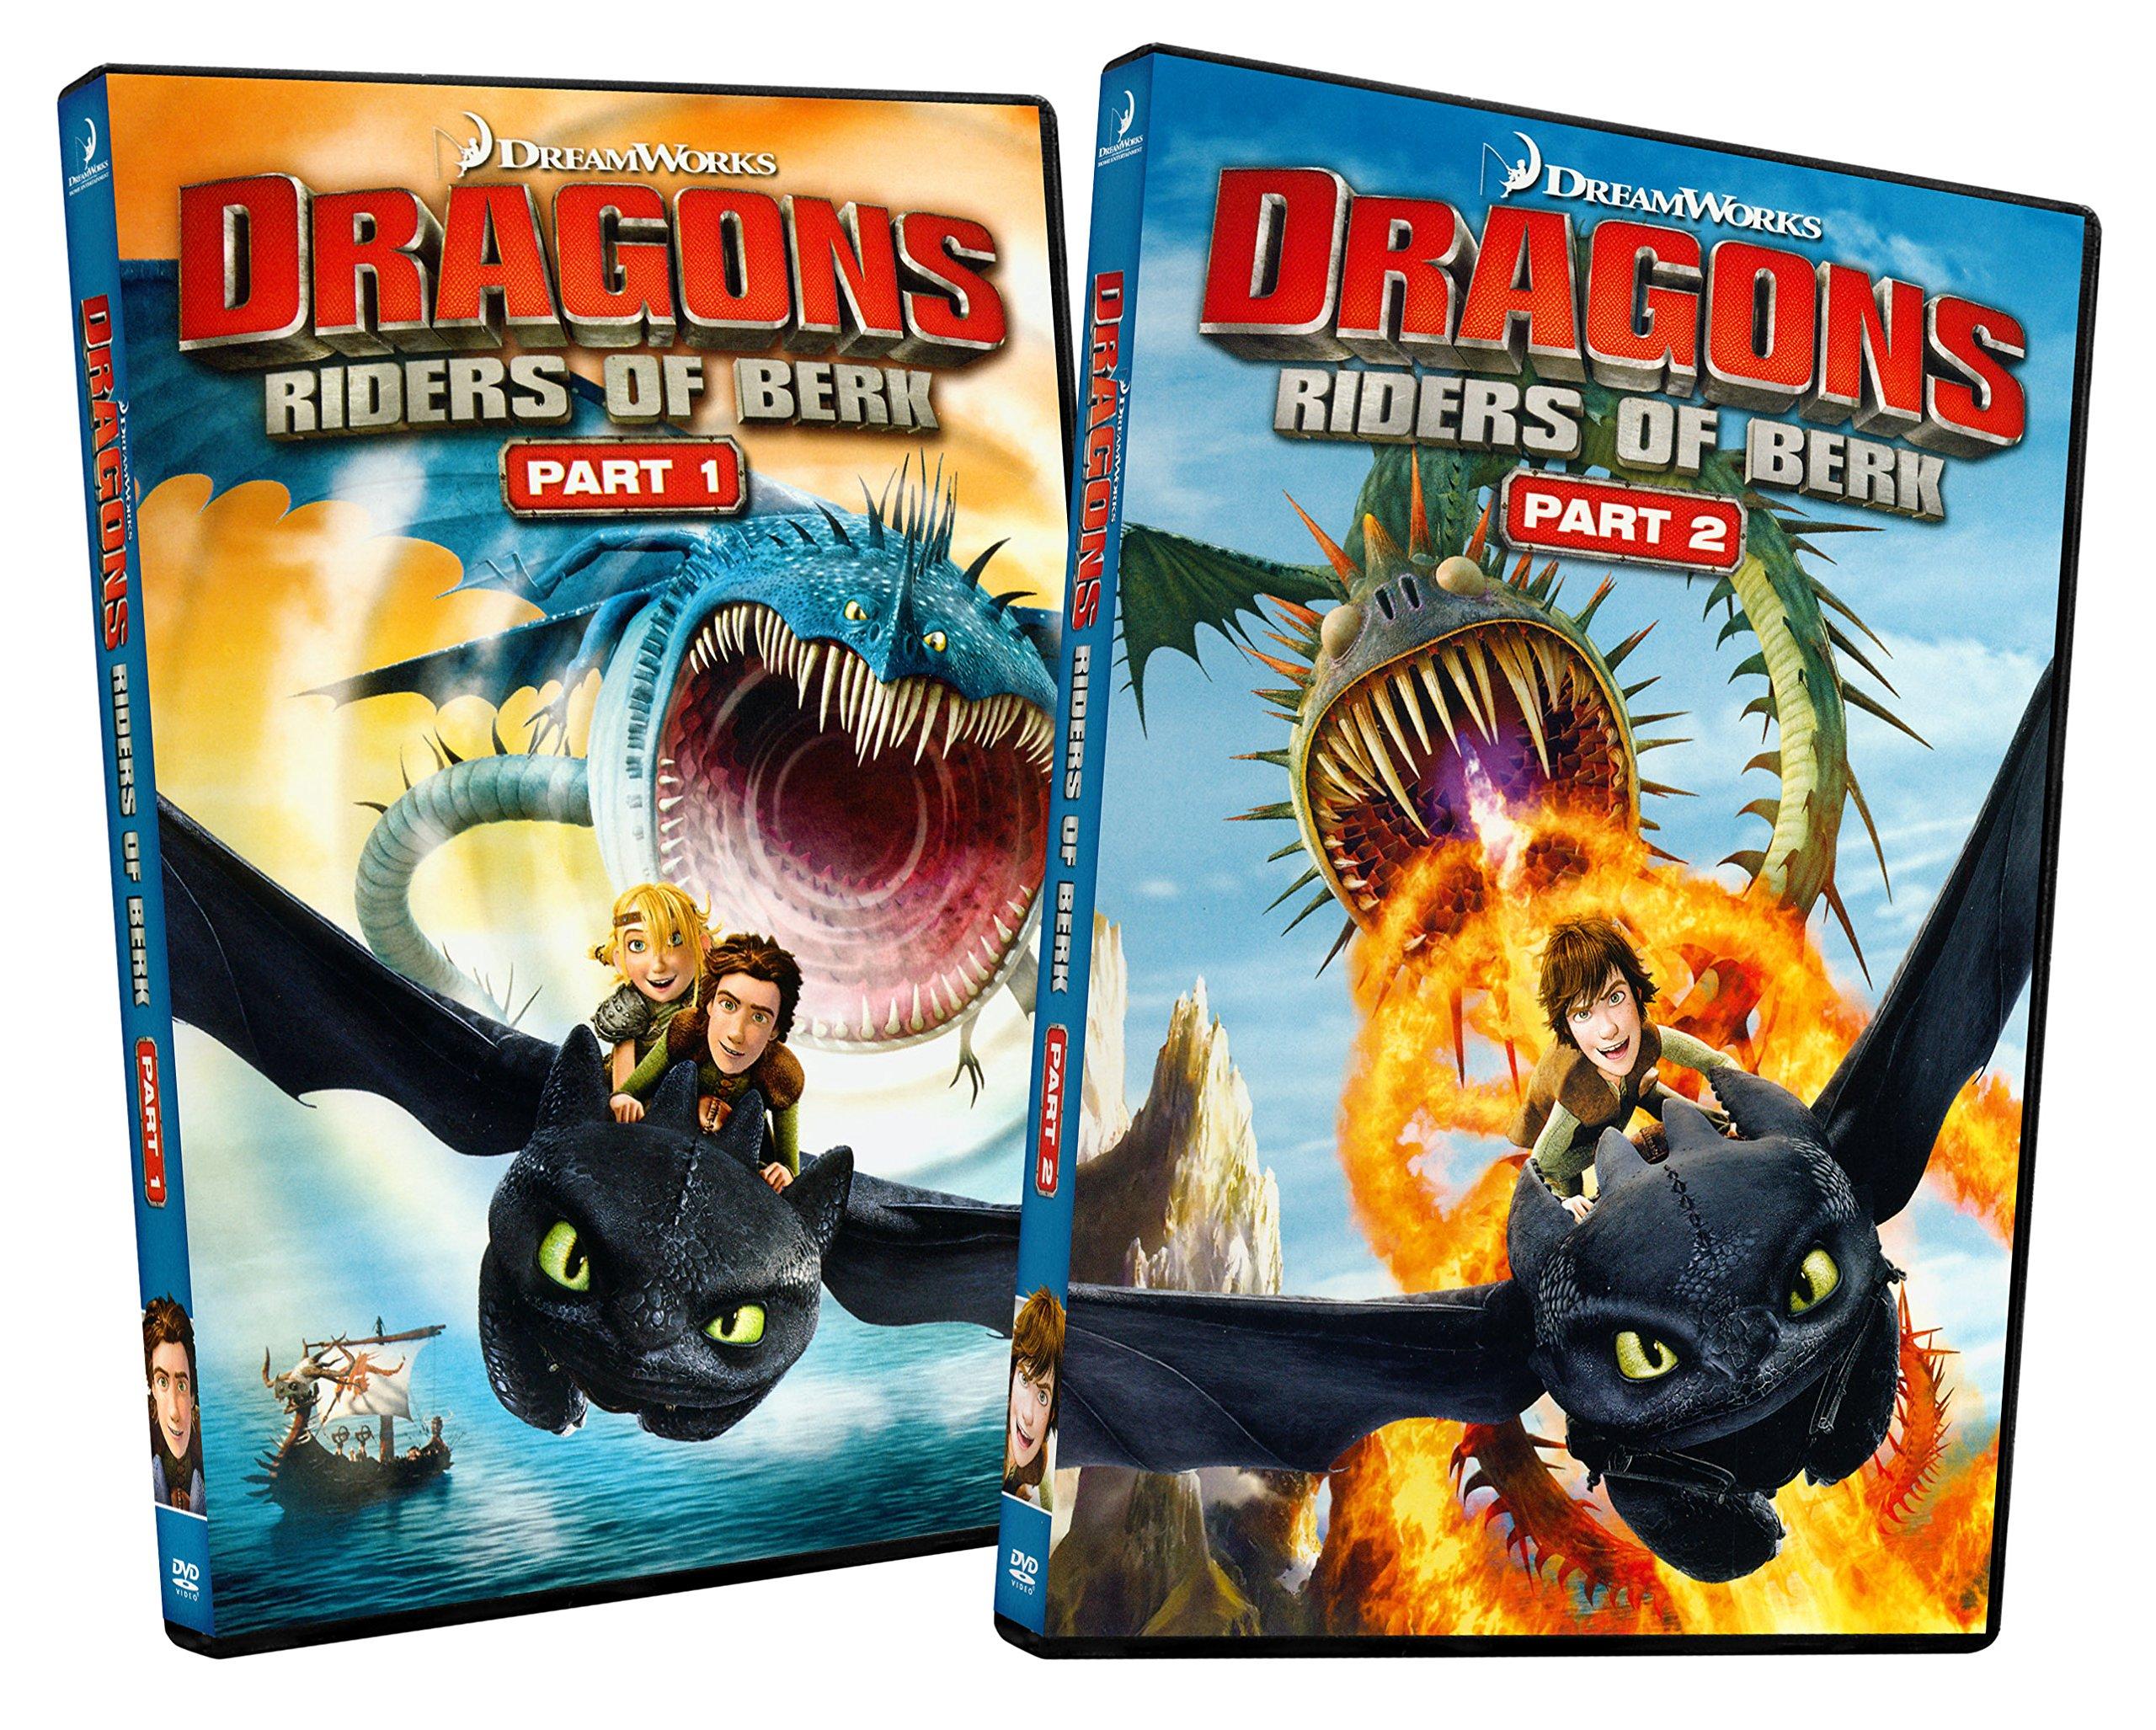 Dragons: Riders of Berk (Part 1 / Part 2)